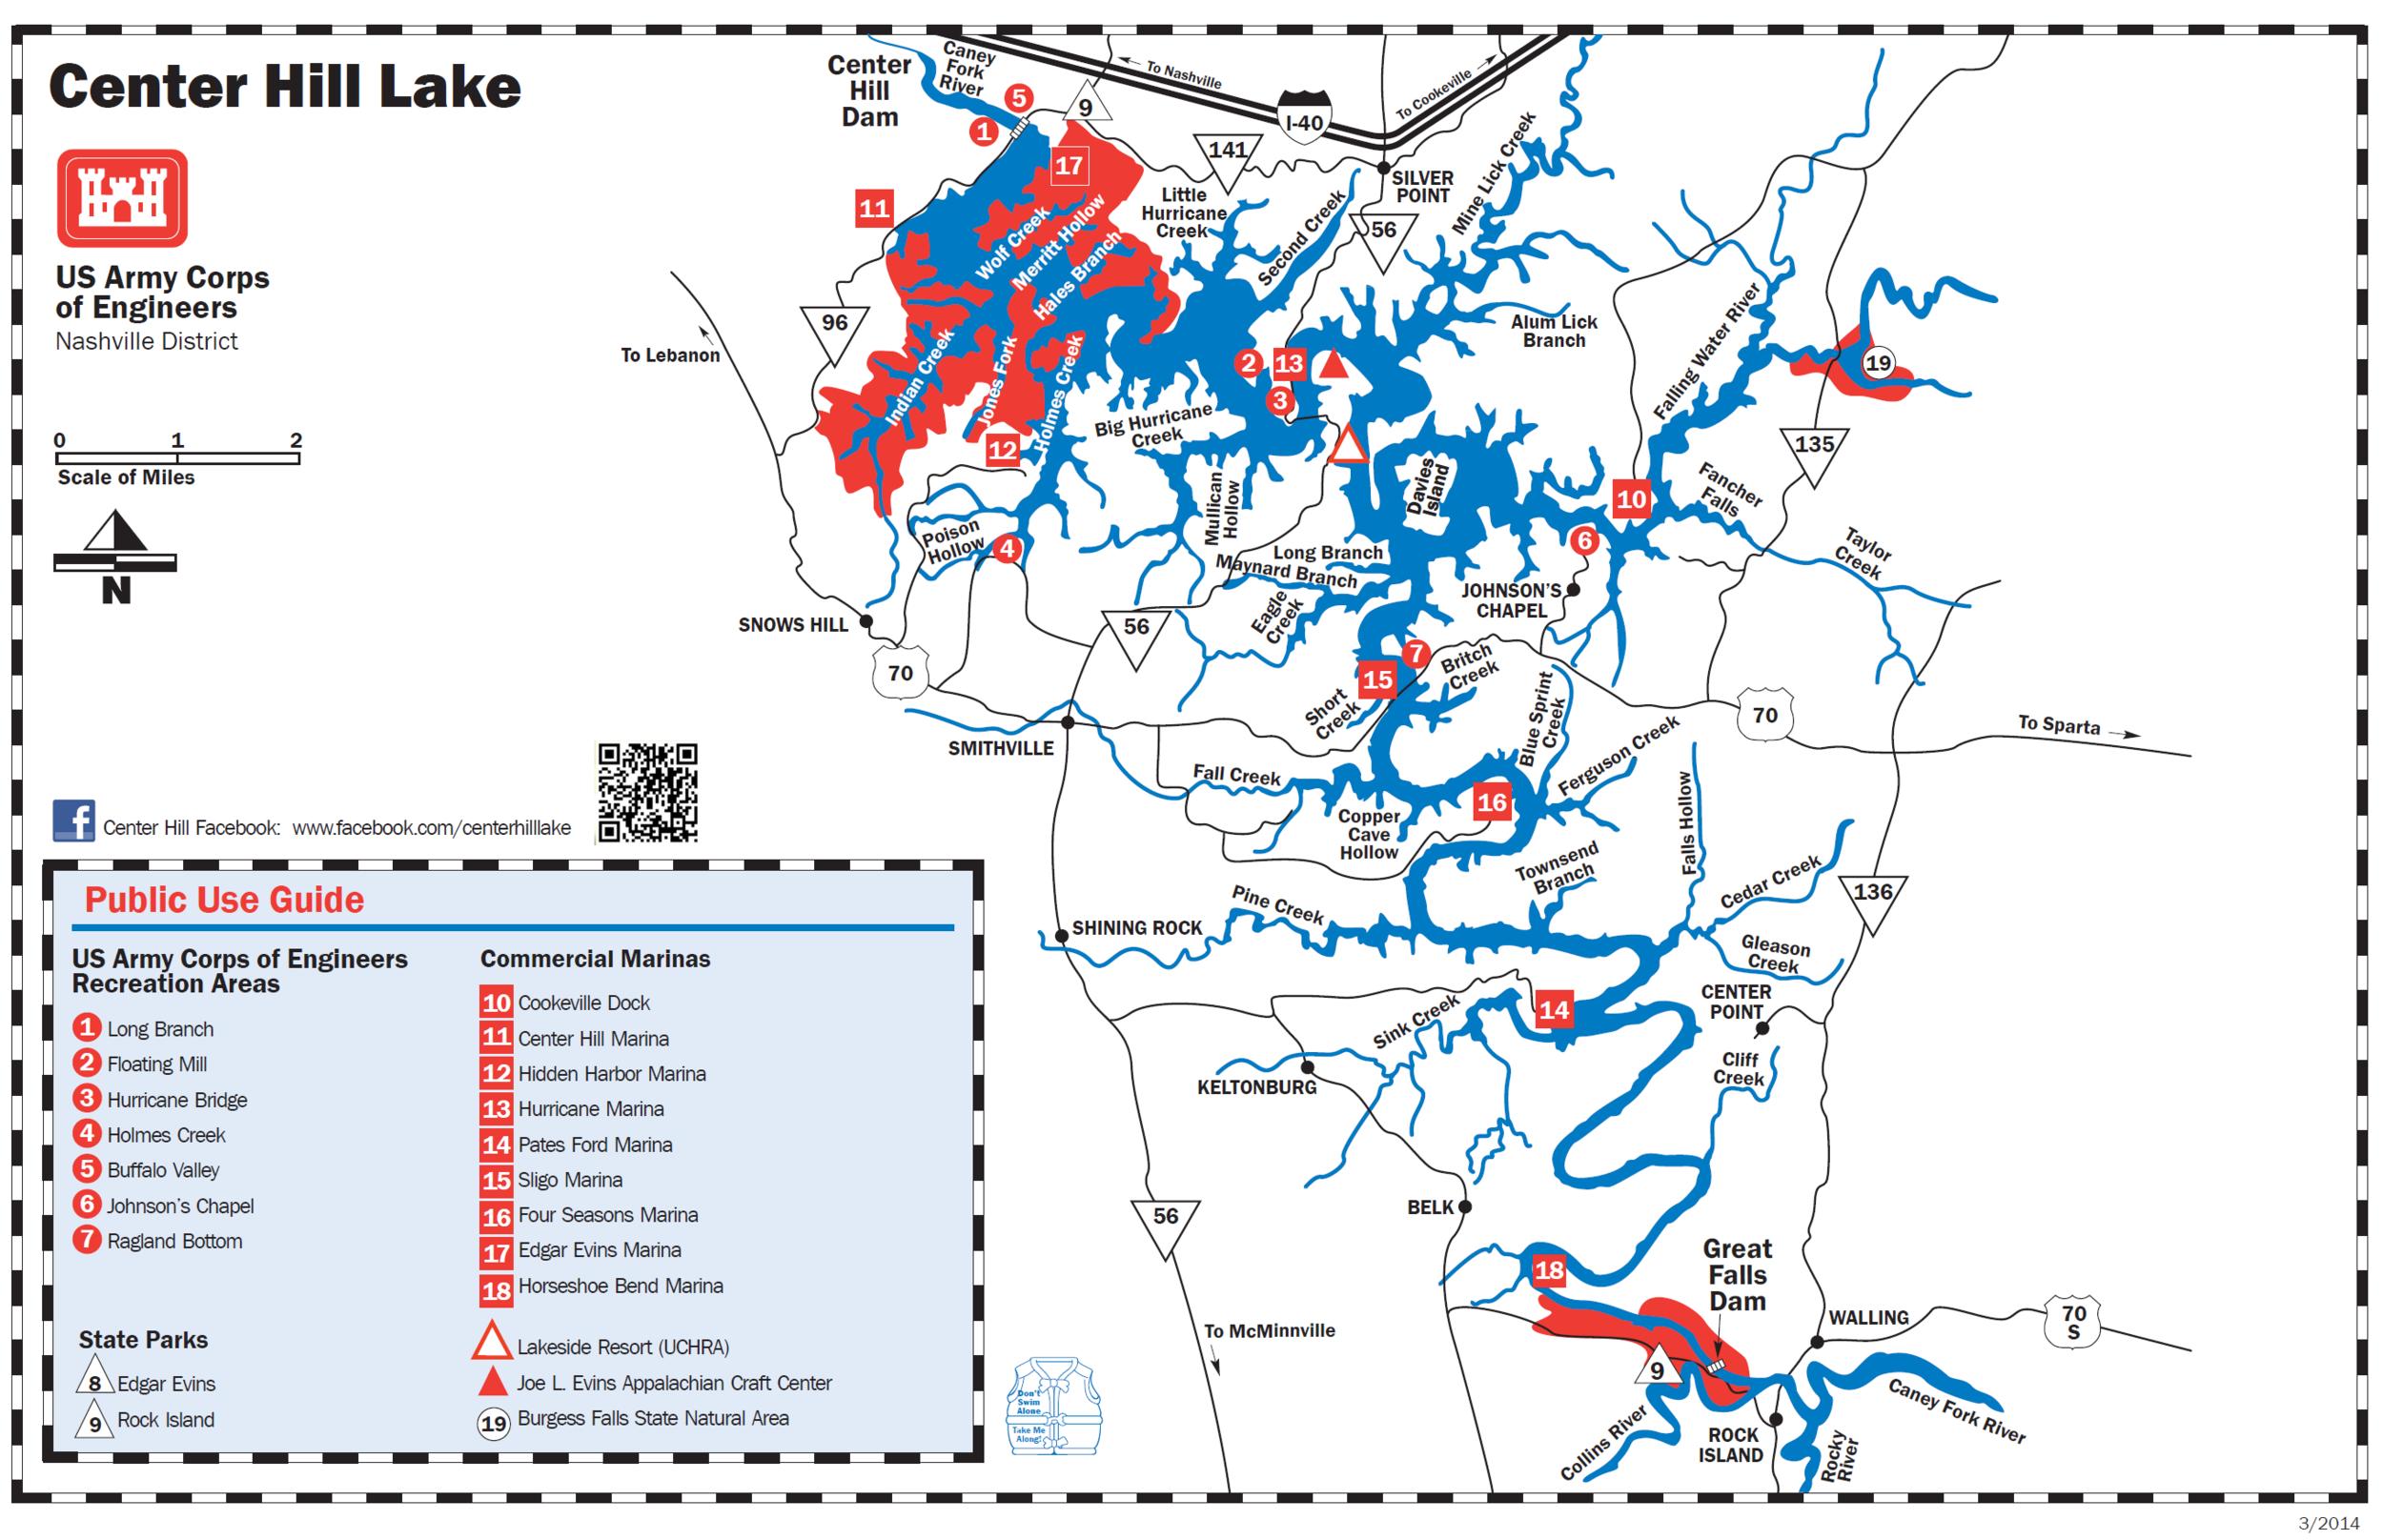 map of center hill lake Center Hill Lake Marinas Map map of center hill lake